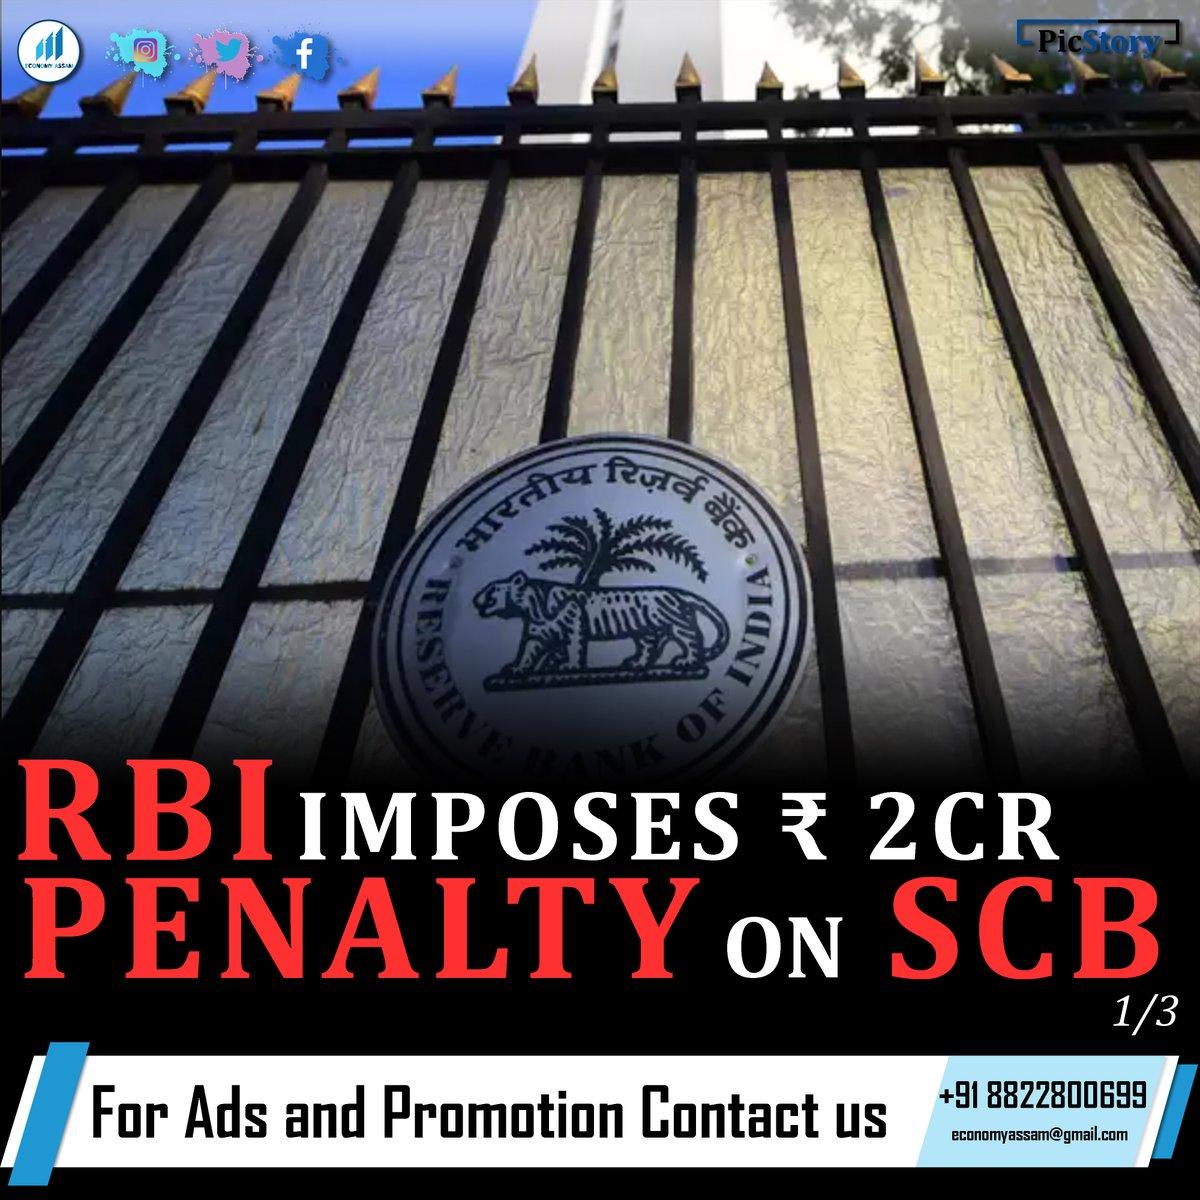 RBI imposes ₹ 2cr Penalty on SCB  #penalty #rbi #standardchartered #india #picstory #economyassam #ReserveBankofIndia #ReserveBank